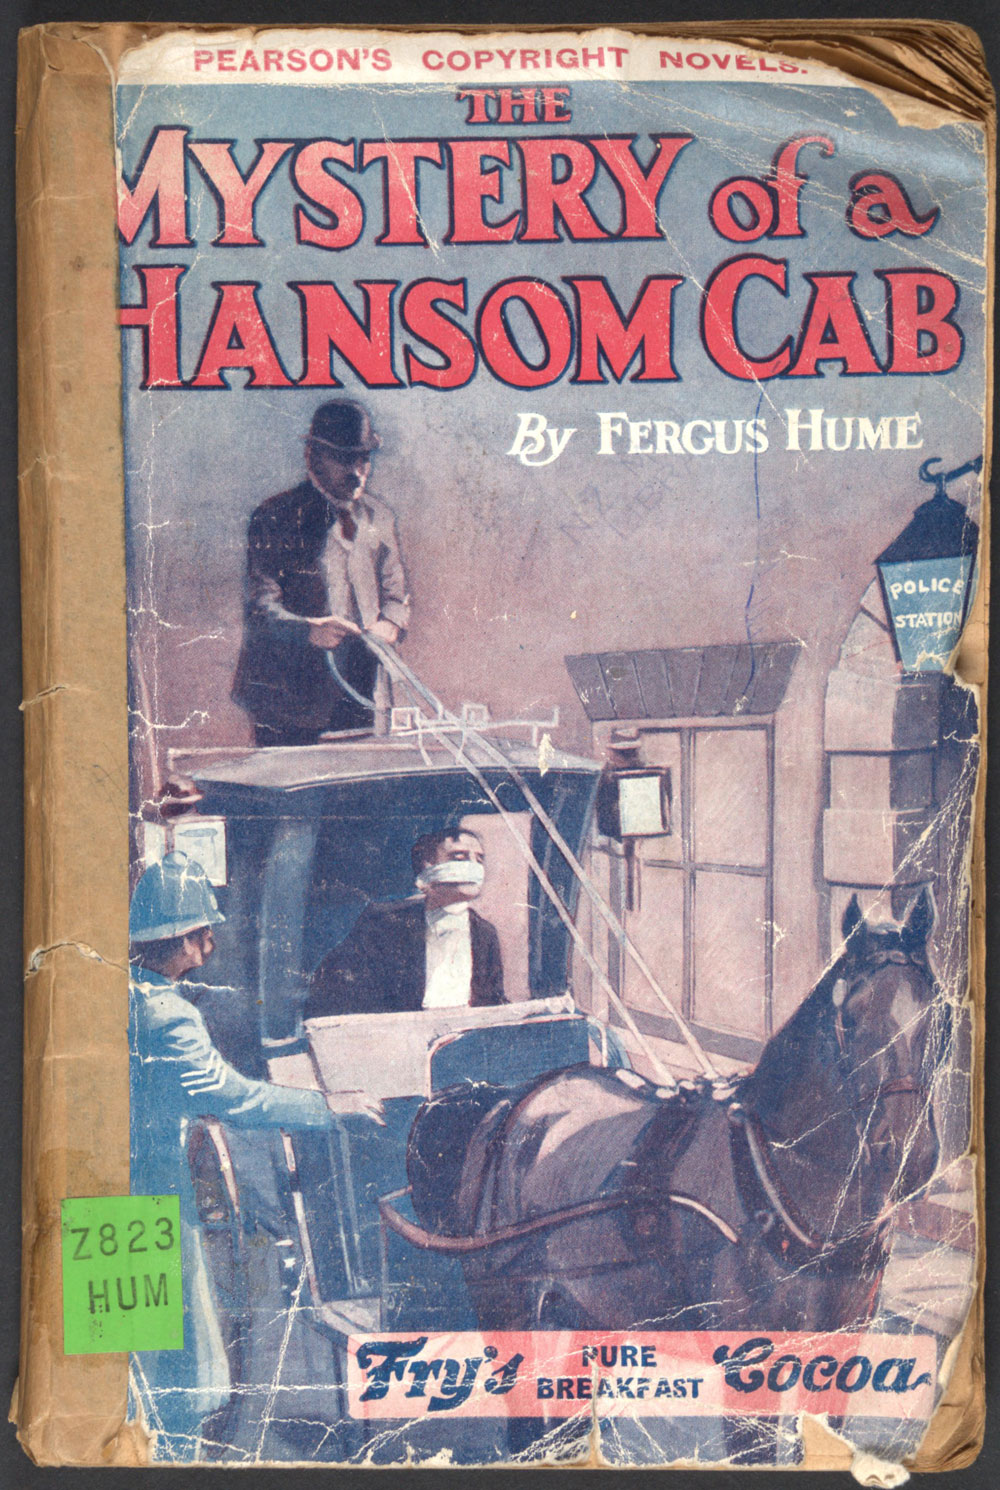 Fergus Hume. <em>The mystery of a Hansom cab.</em> London: C. Arthur Pearson, [1908?]